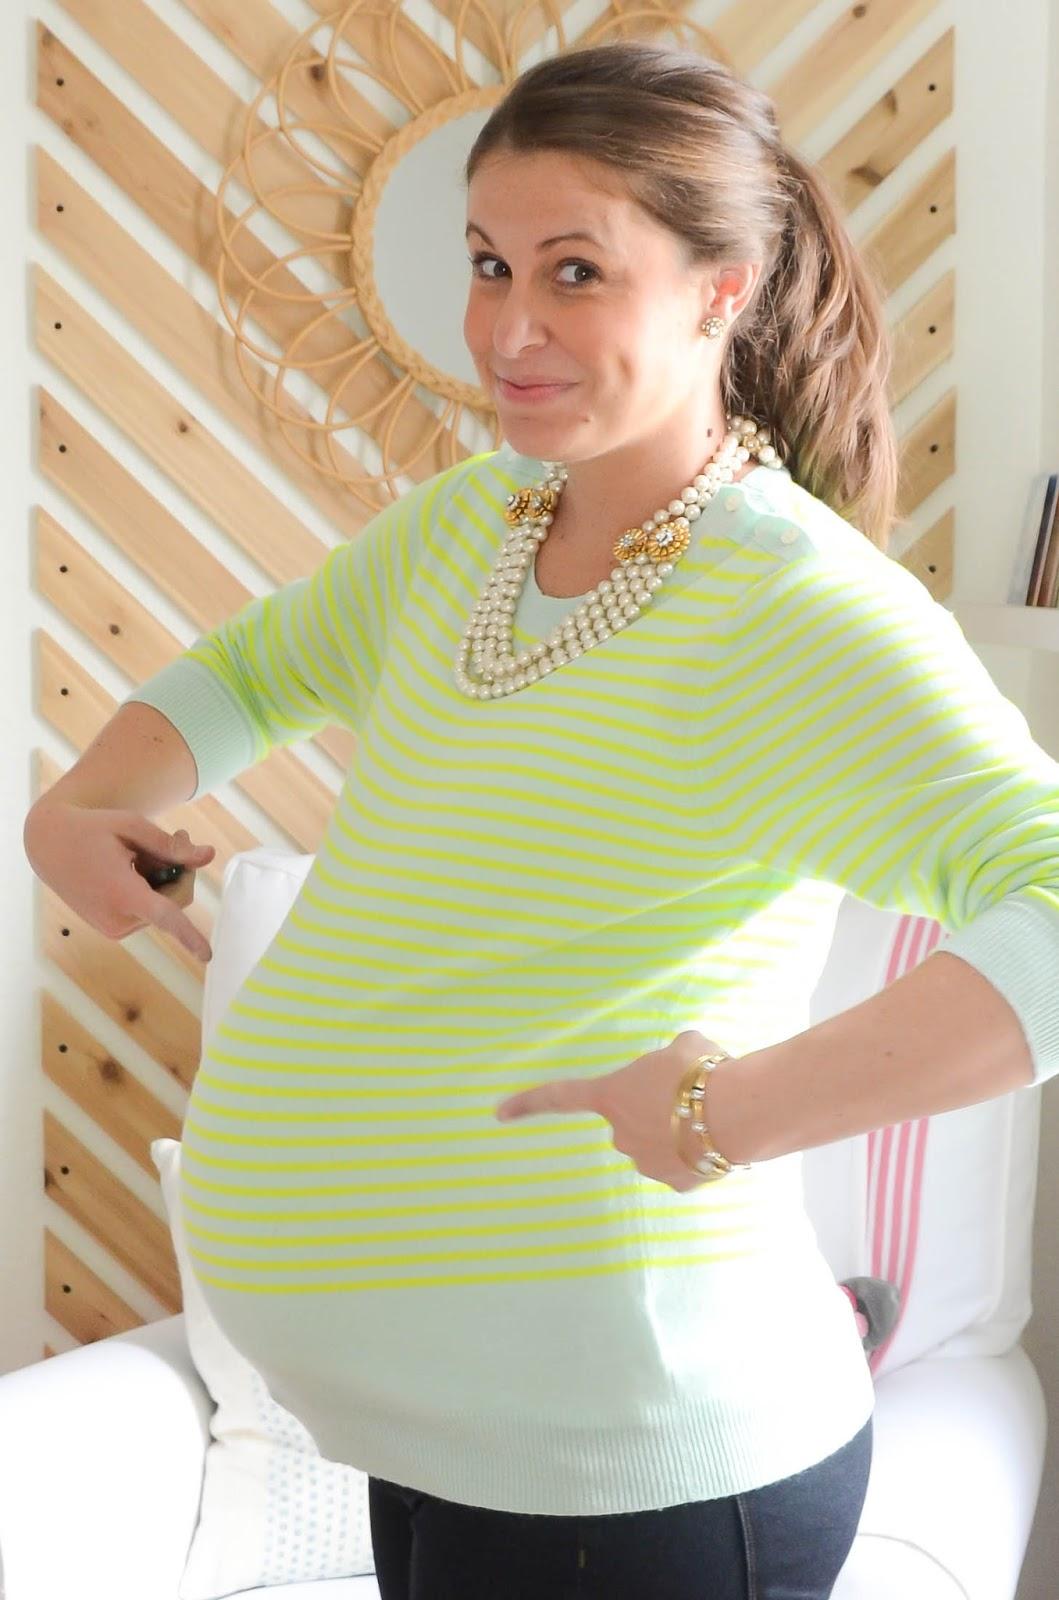 IRON & TWINE: 31 Weeks Pregnant | Twins